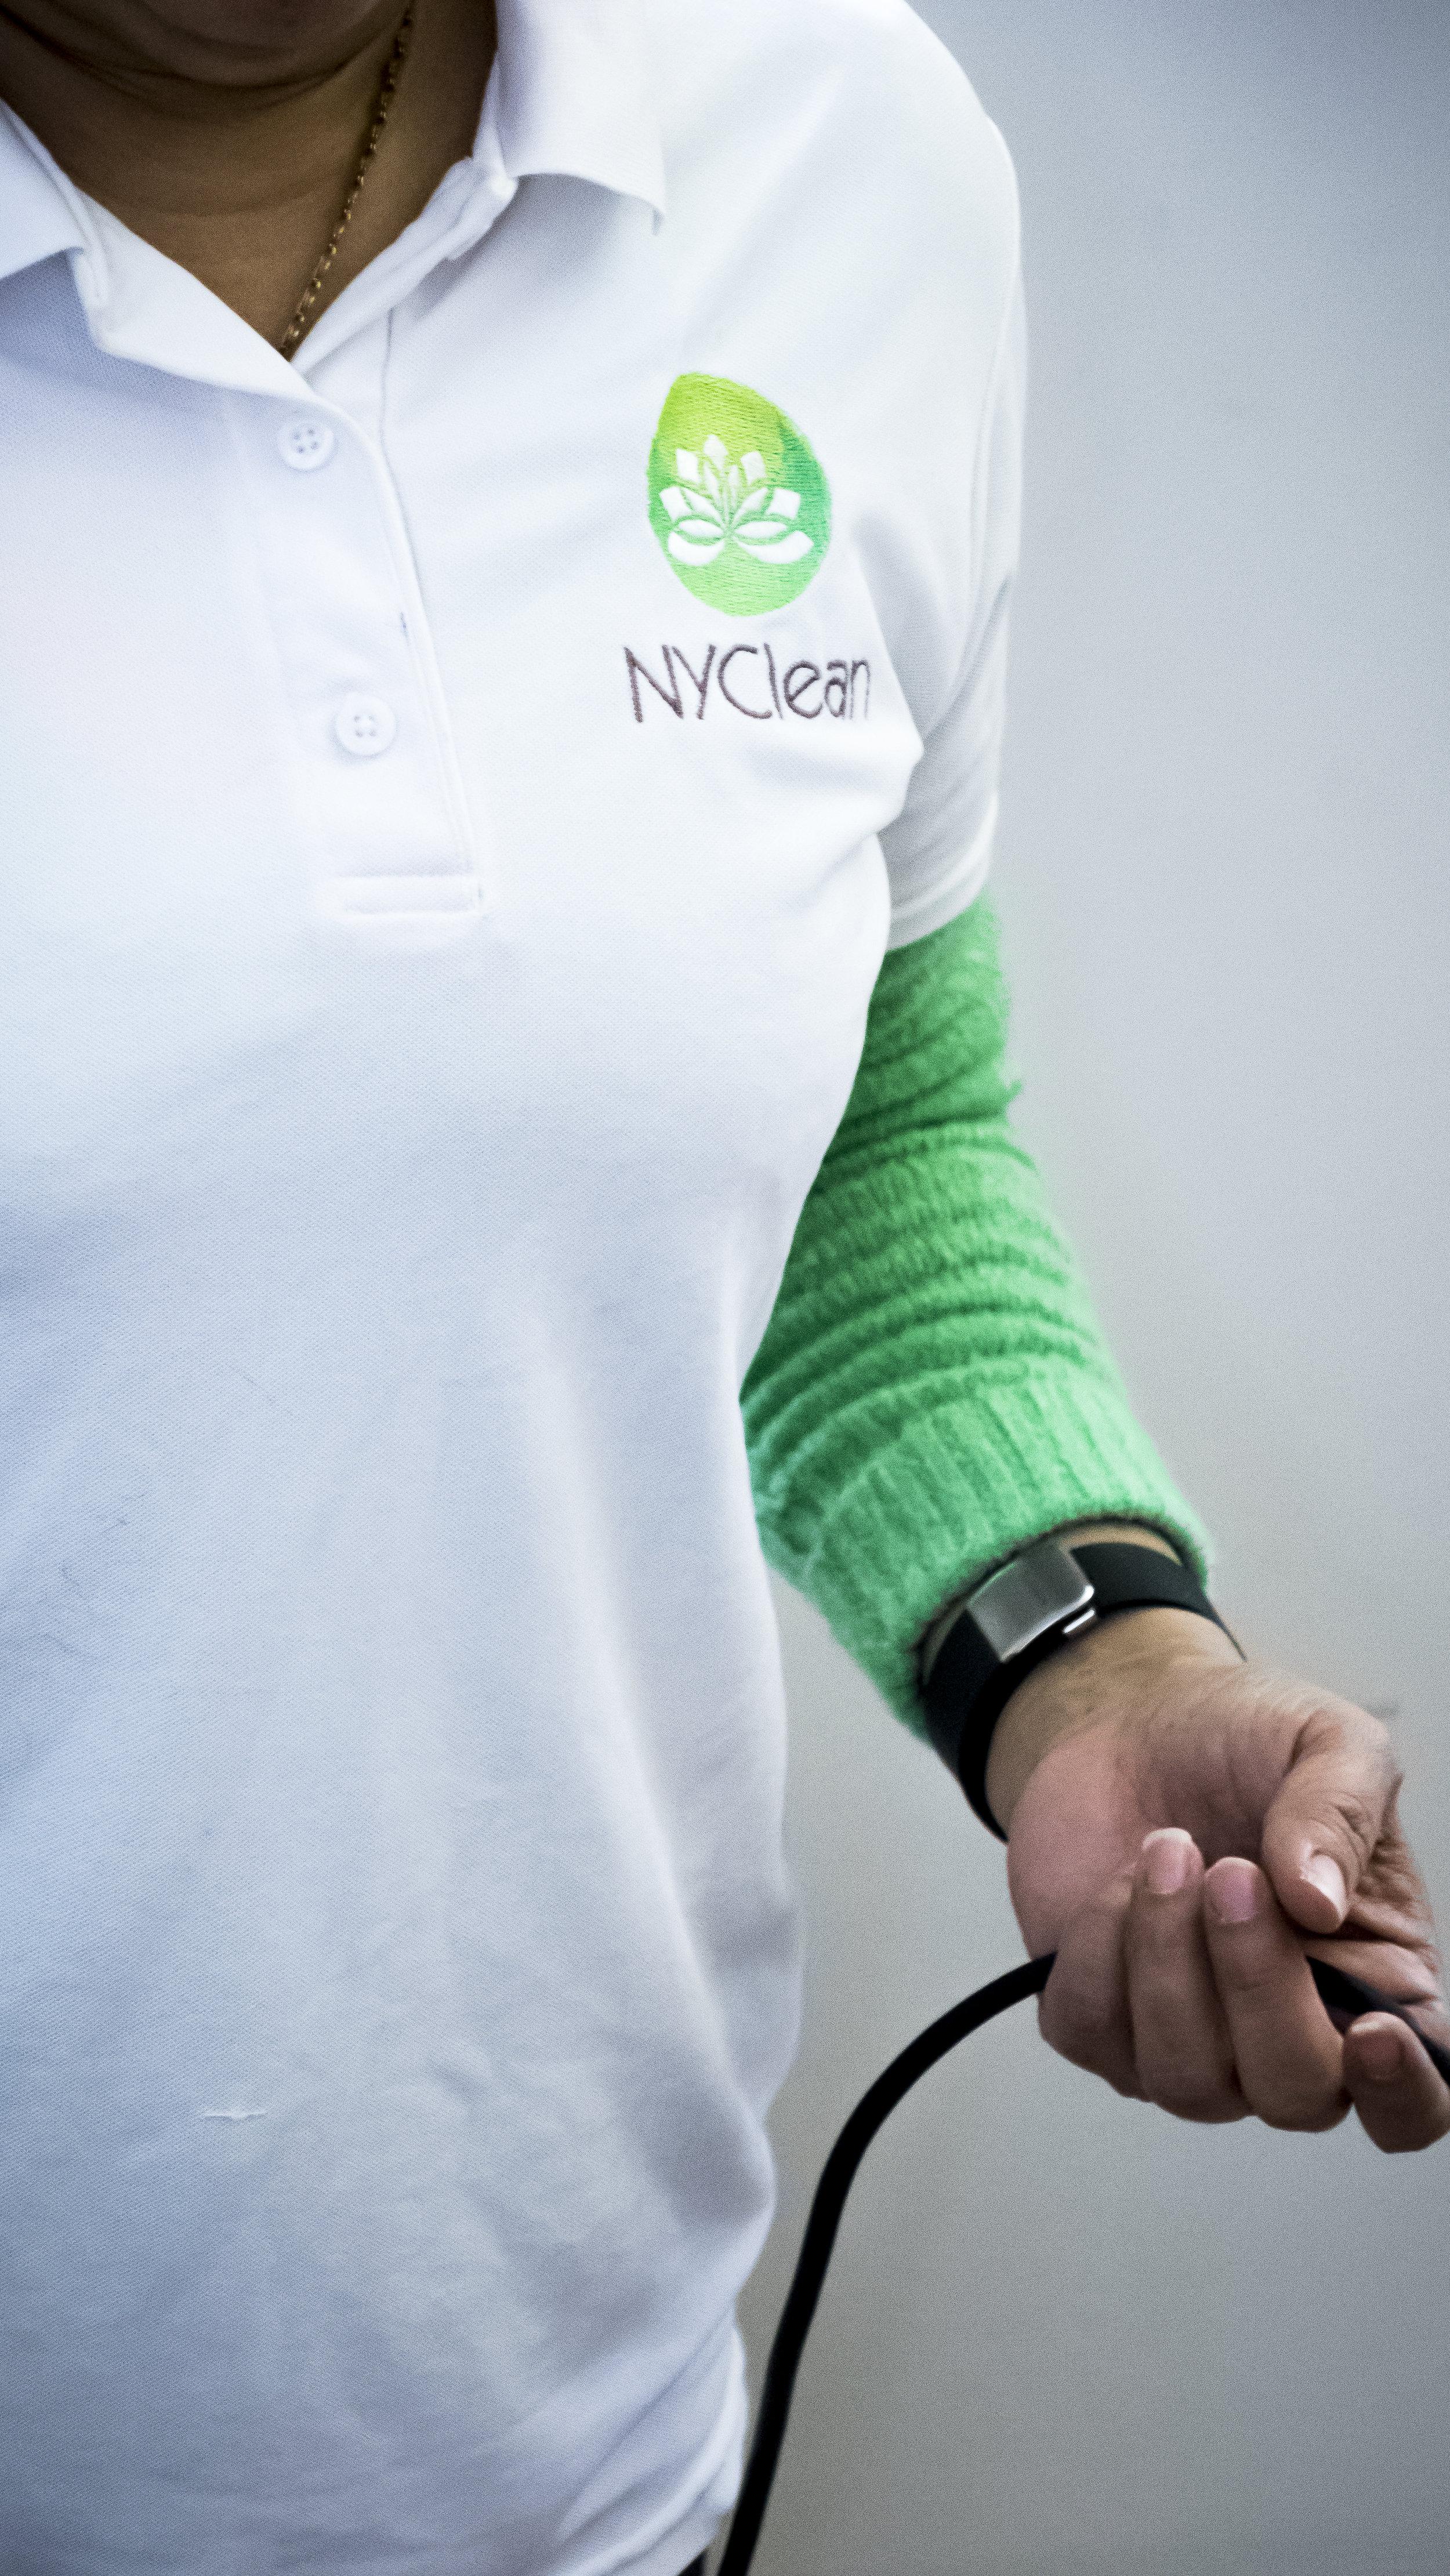 DSC03433logoshirt.JPG